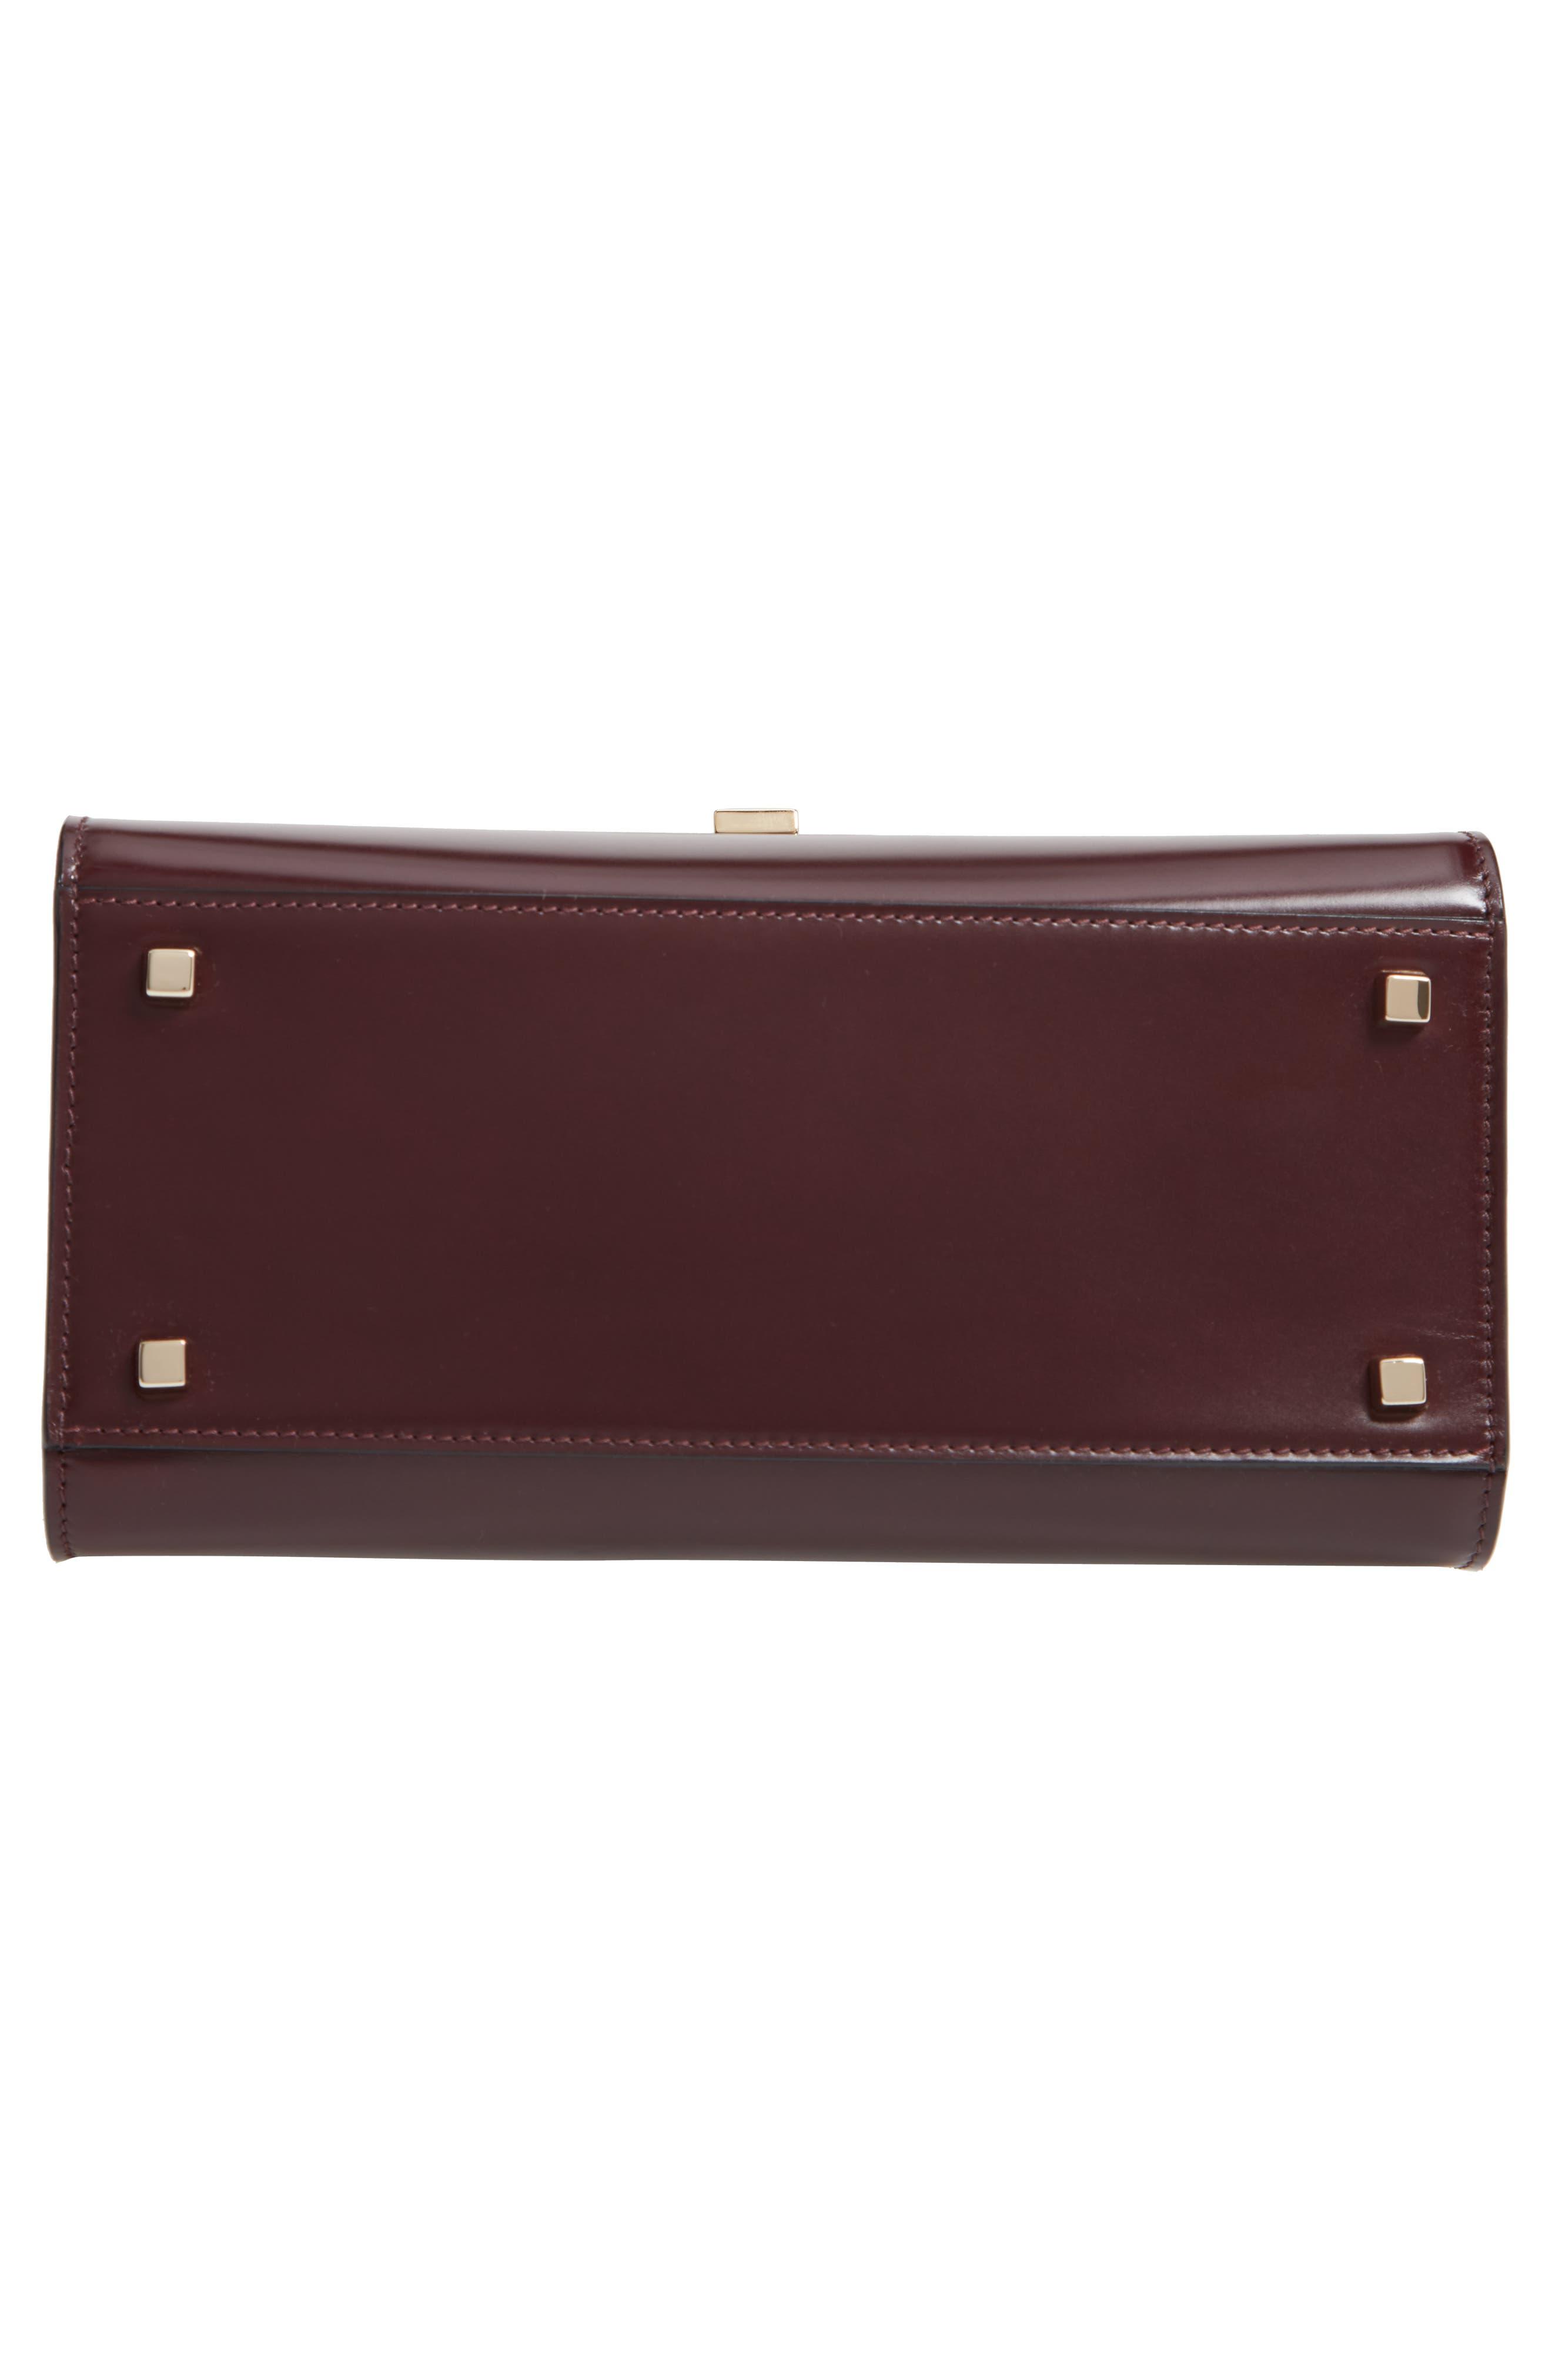 Iside Medium Colorblock Leather Top Handle Bag,                             Alternate thumbnail 6, color,                             FRAGOLA/ GRANATA